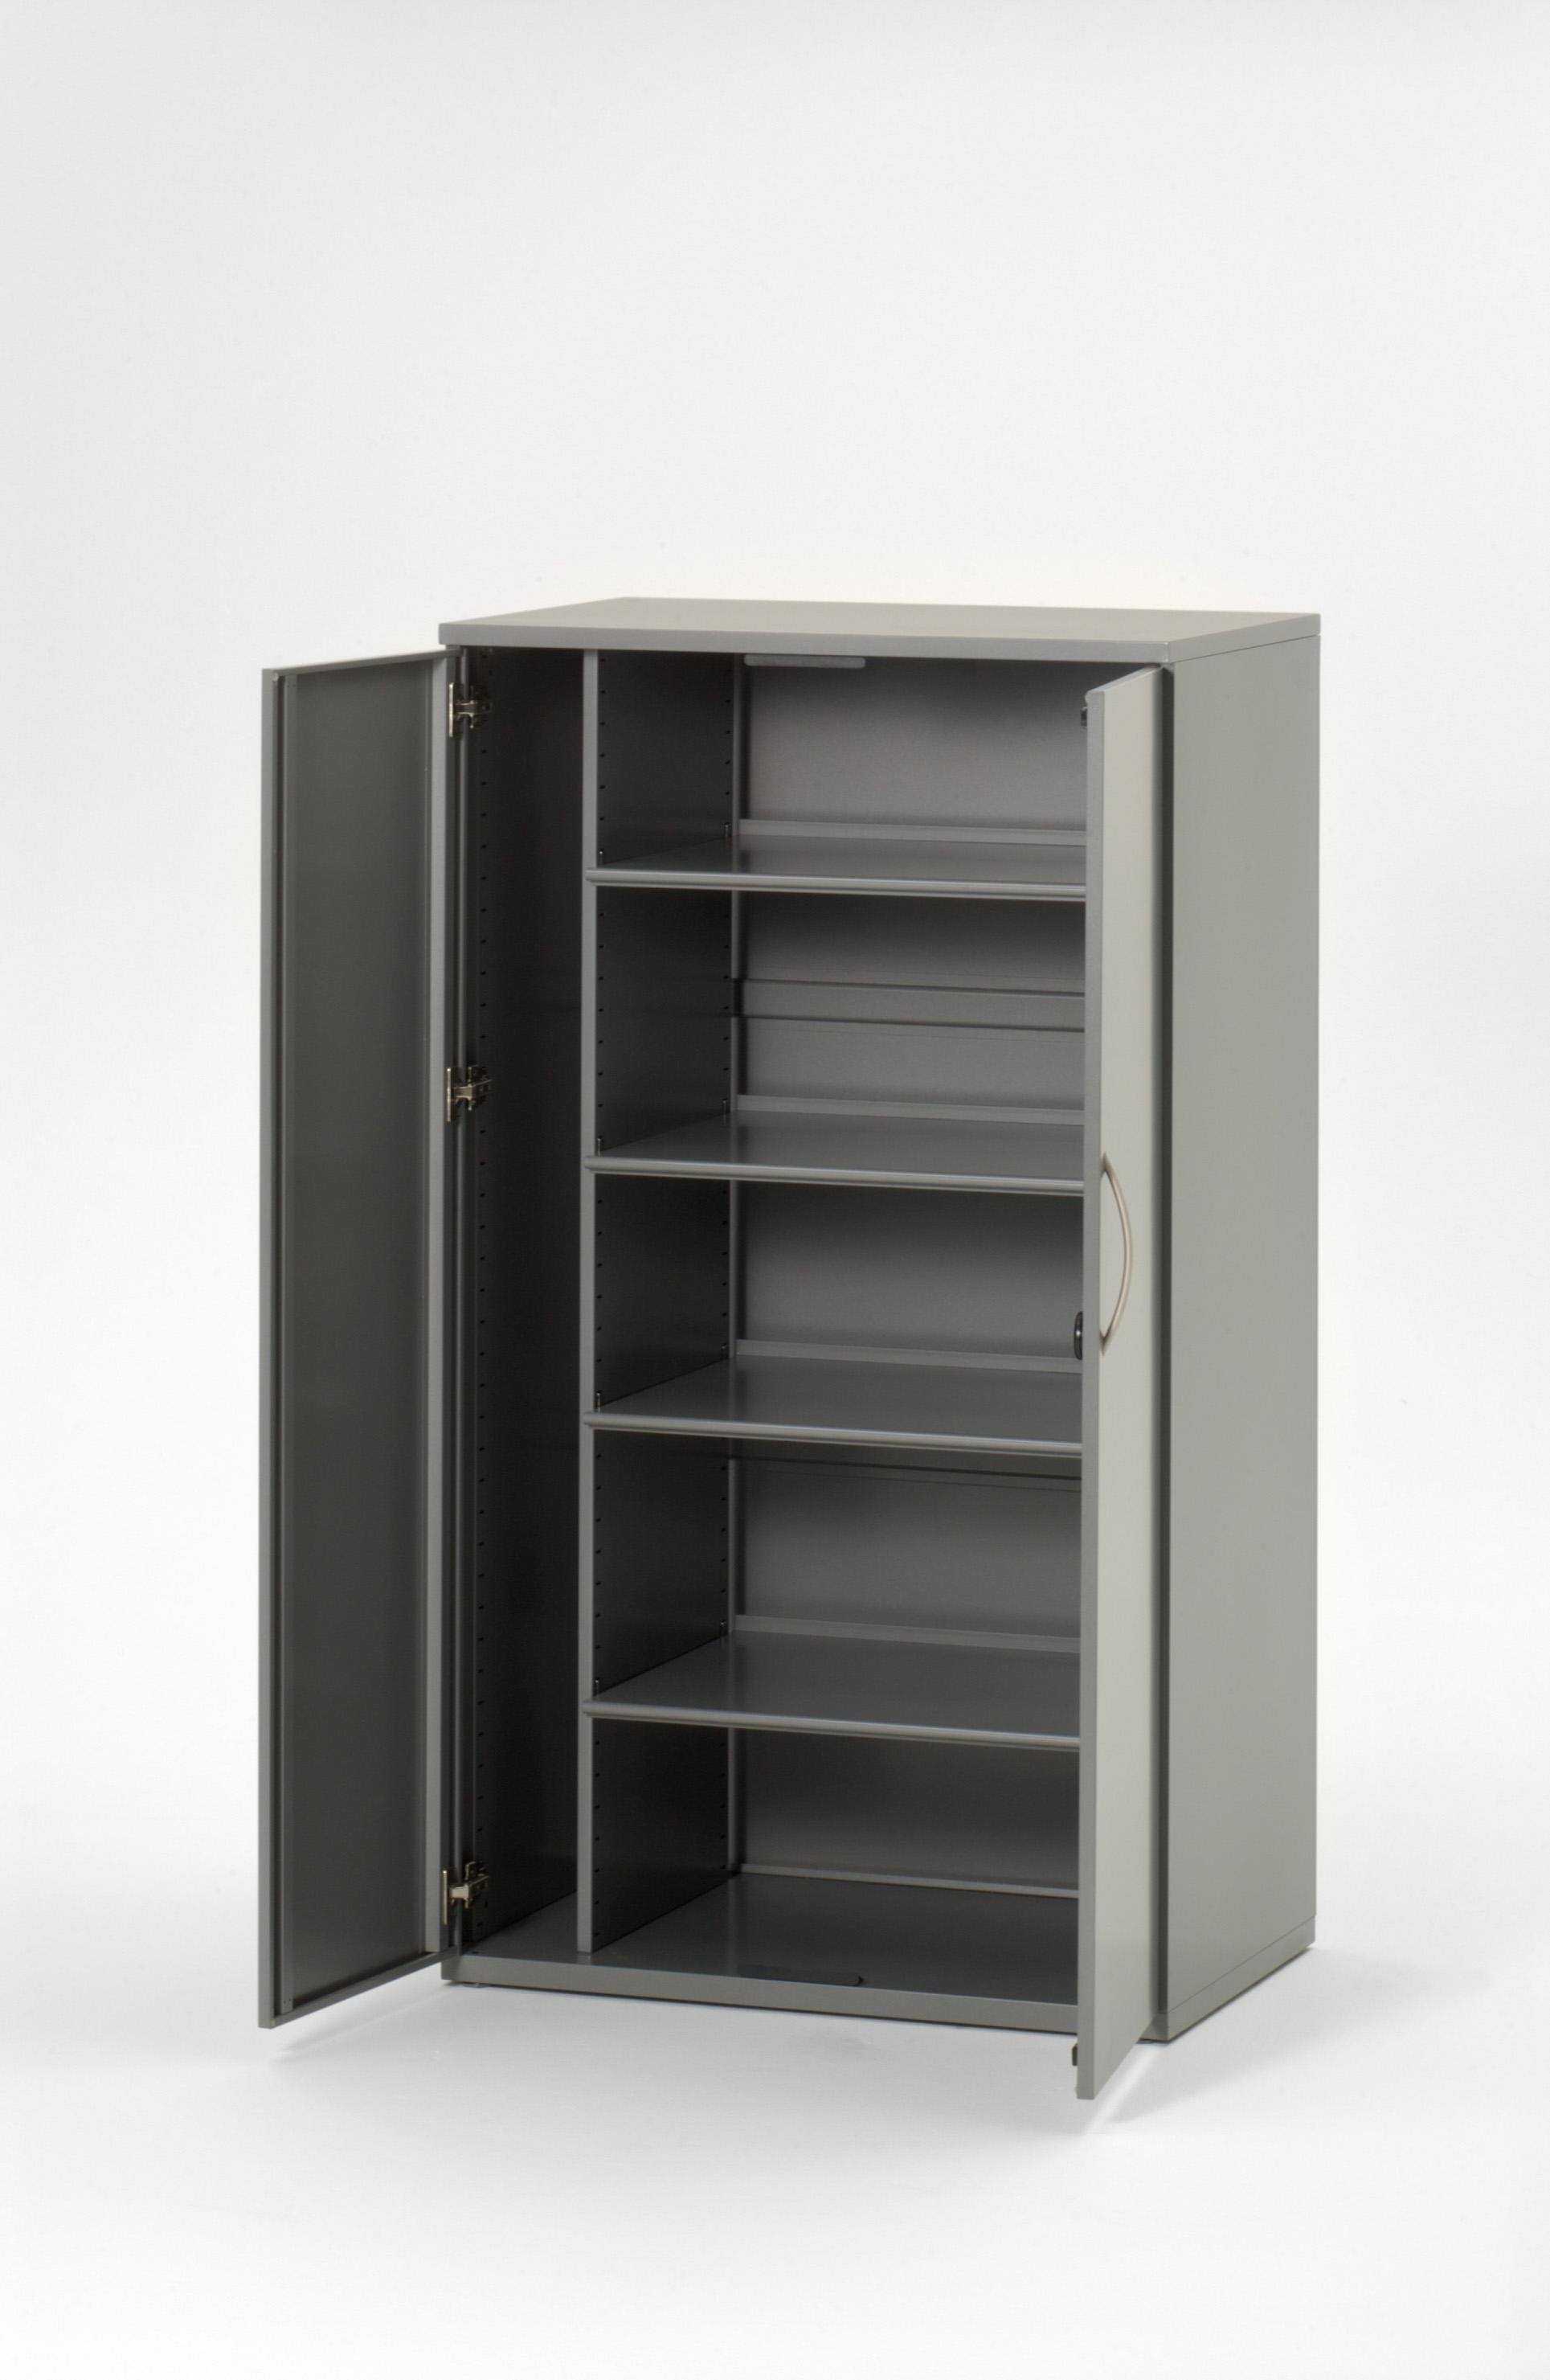 Universal Storage Cabinets